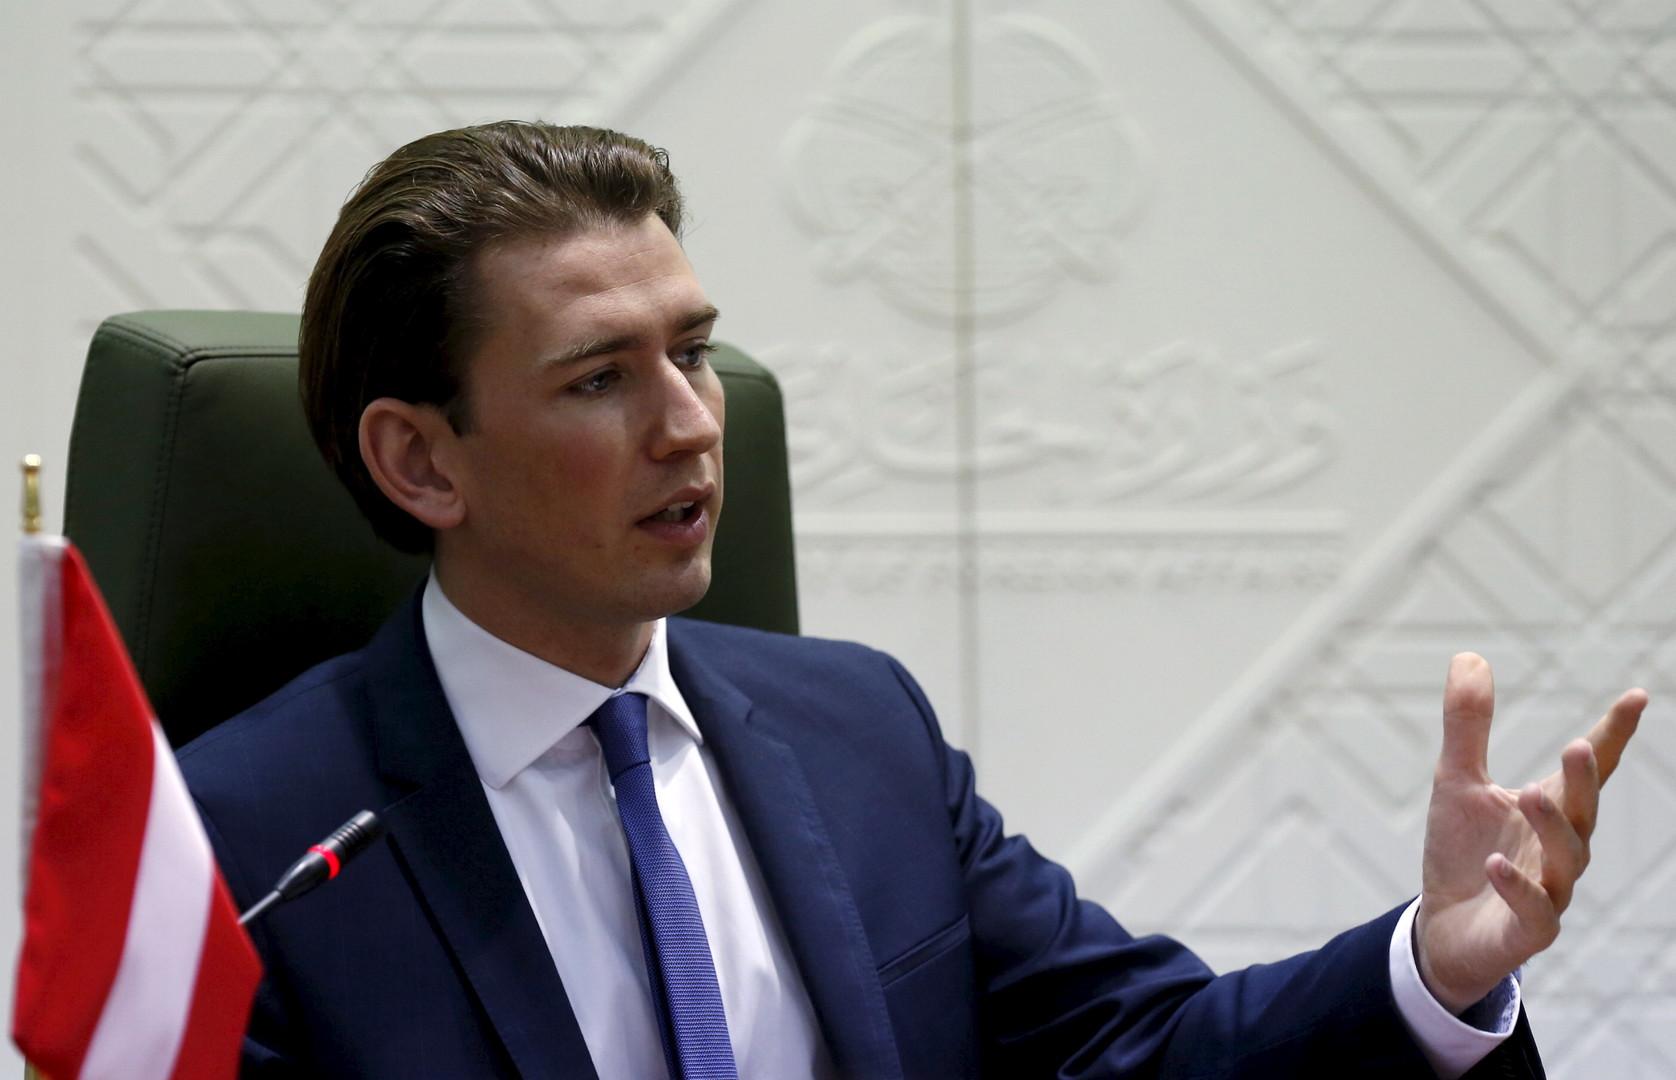 Шаг за шагом: глава МИД Австрии предложил схему по снятию санкций с РФ